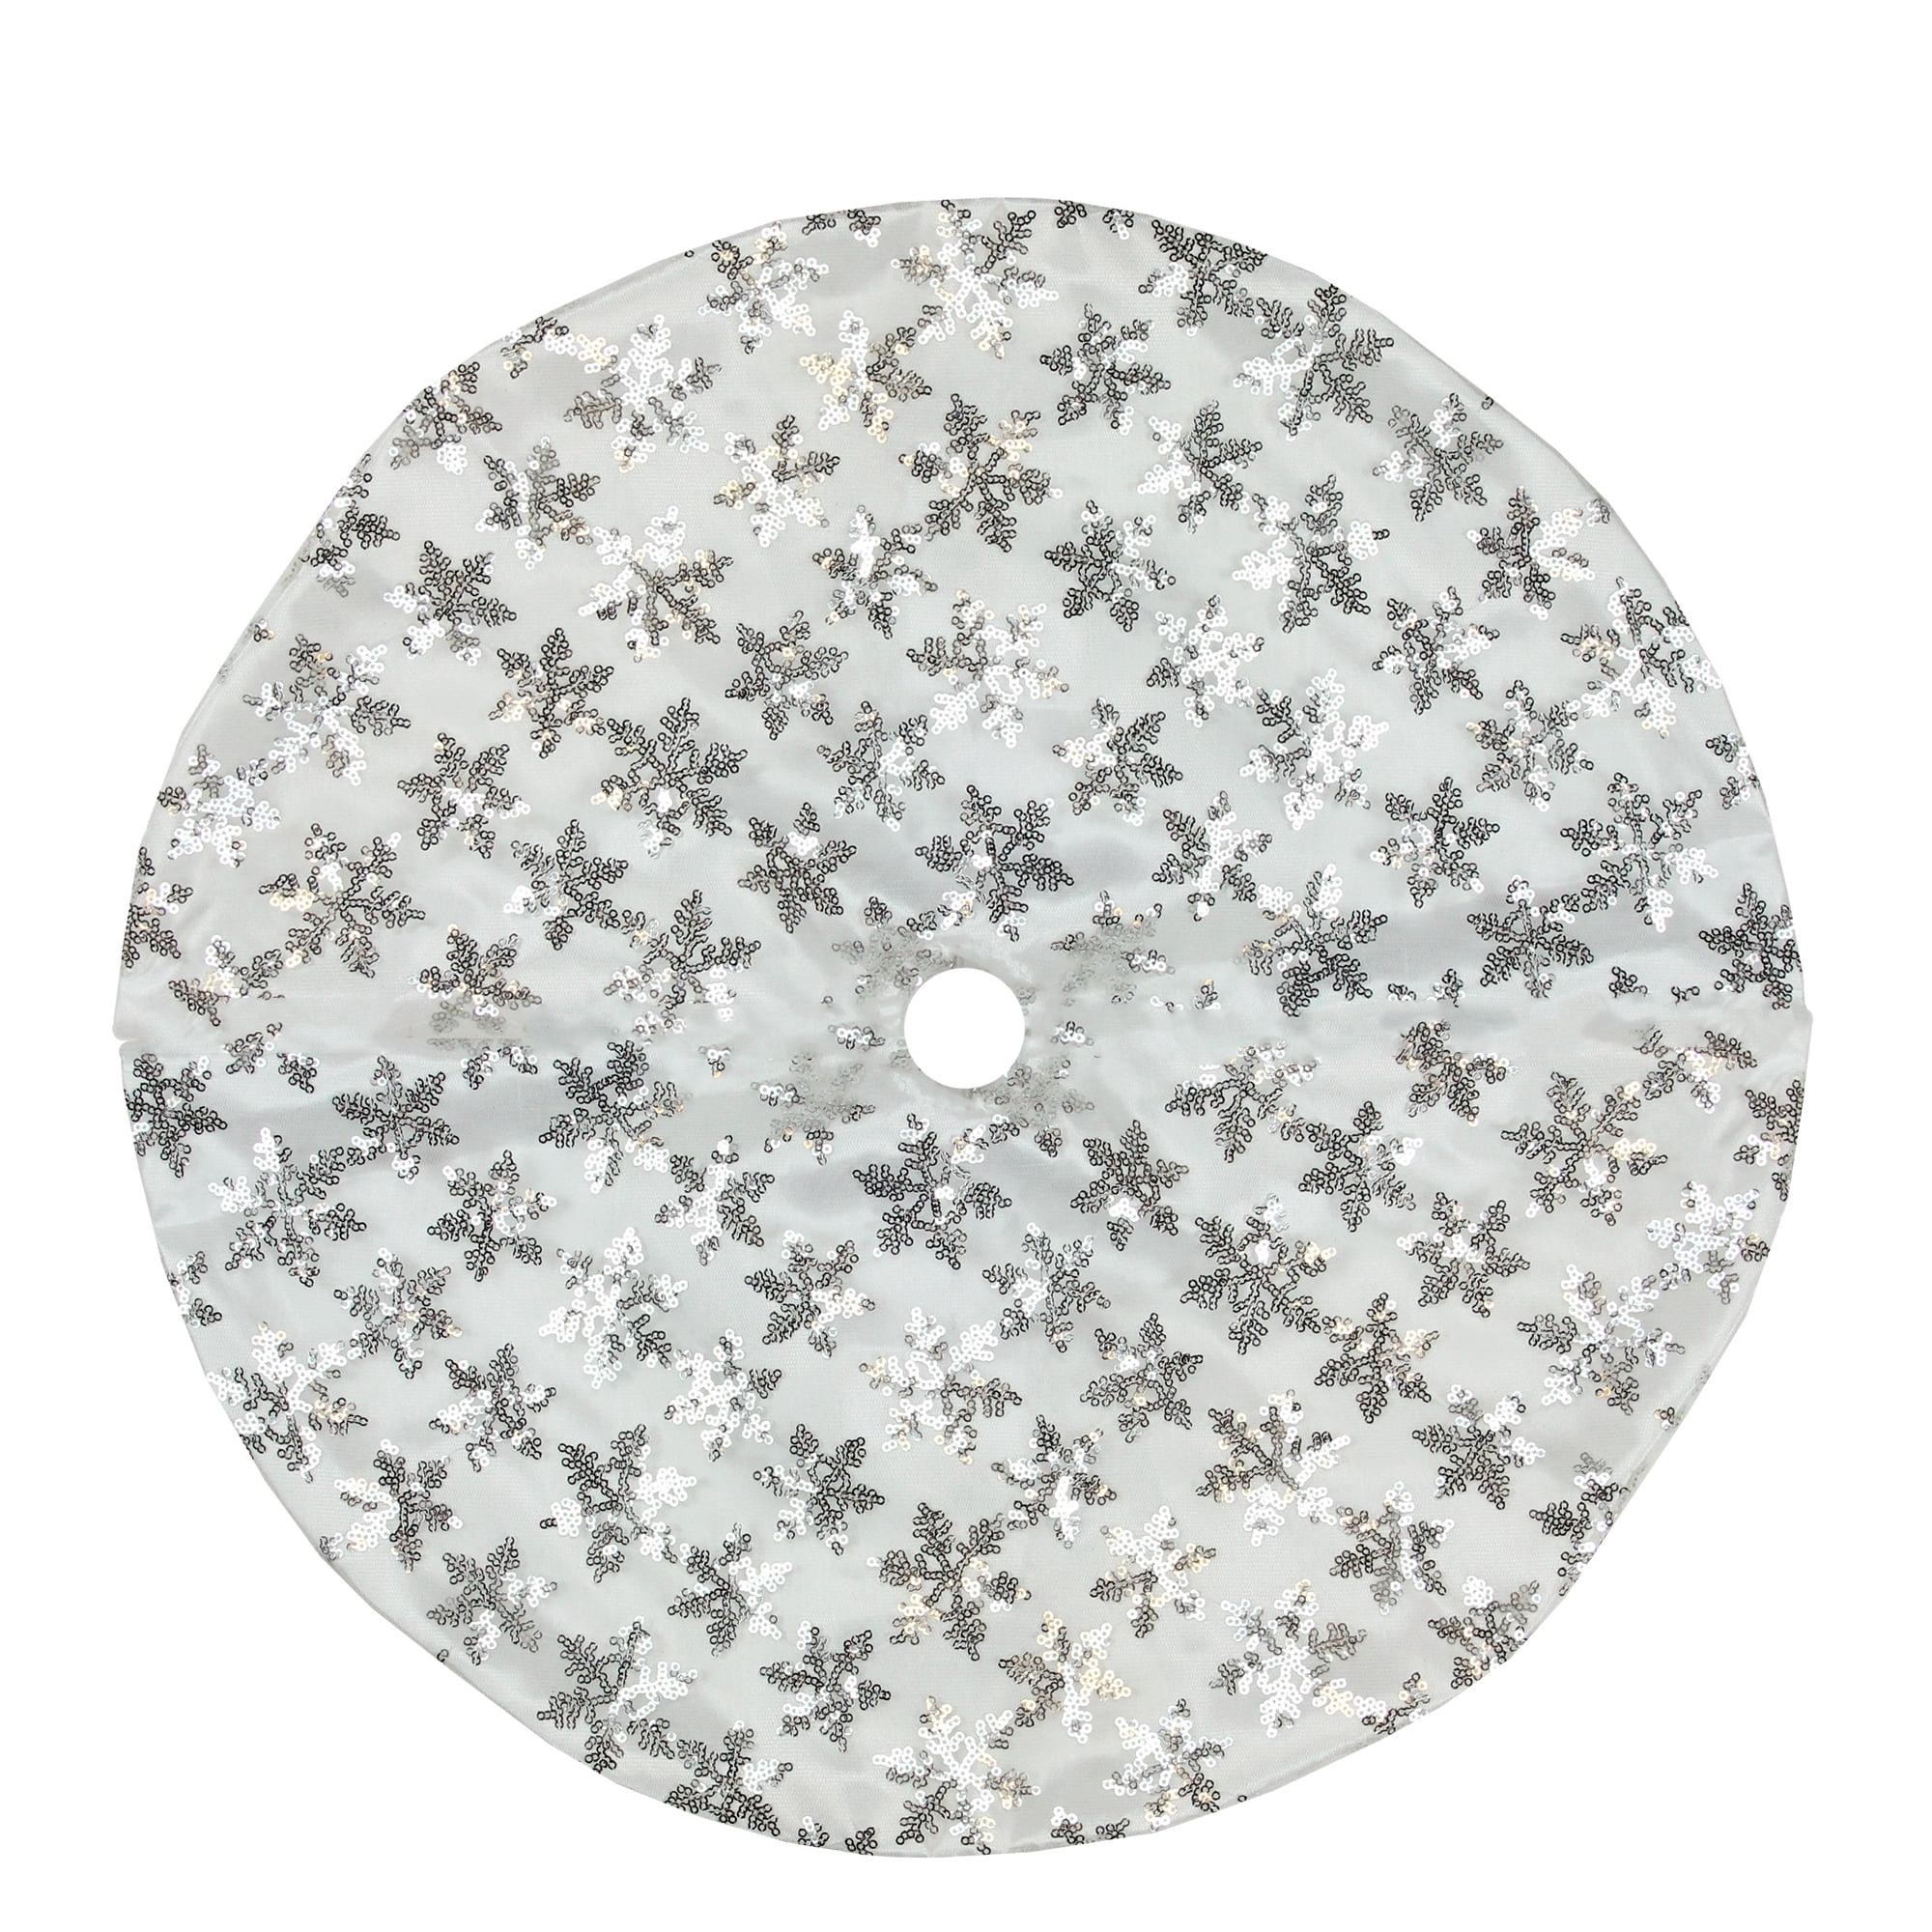 Mini Christmas Tree Skirt Pattern.20 White And Silver Sequin Snowflake Pattern Mini Christmas Tree Skirt